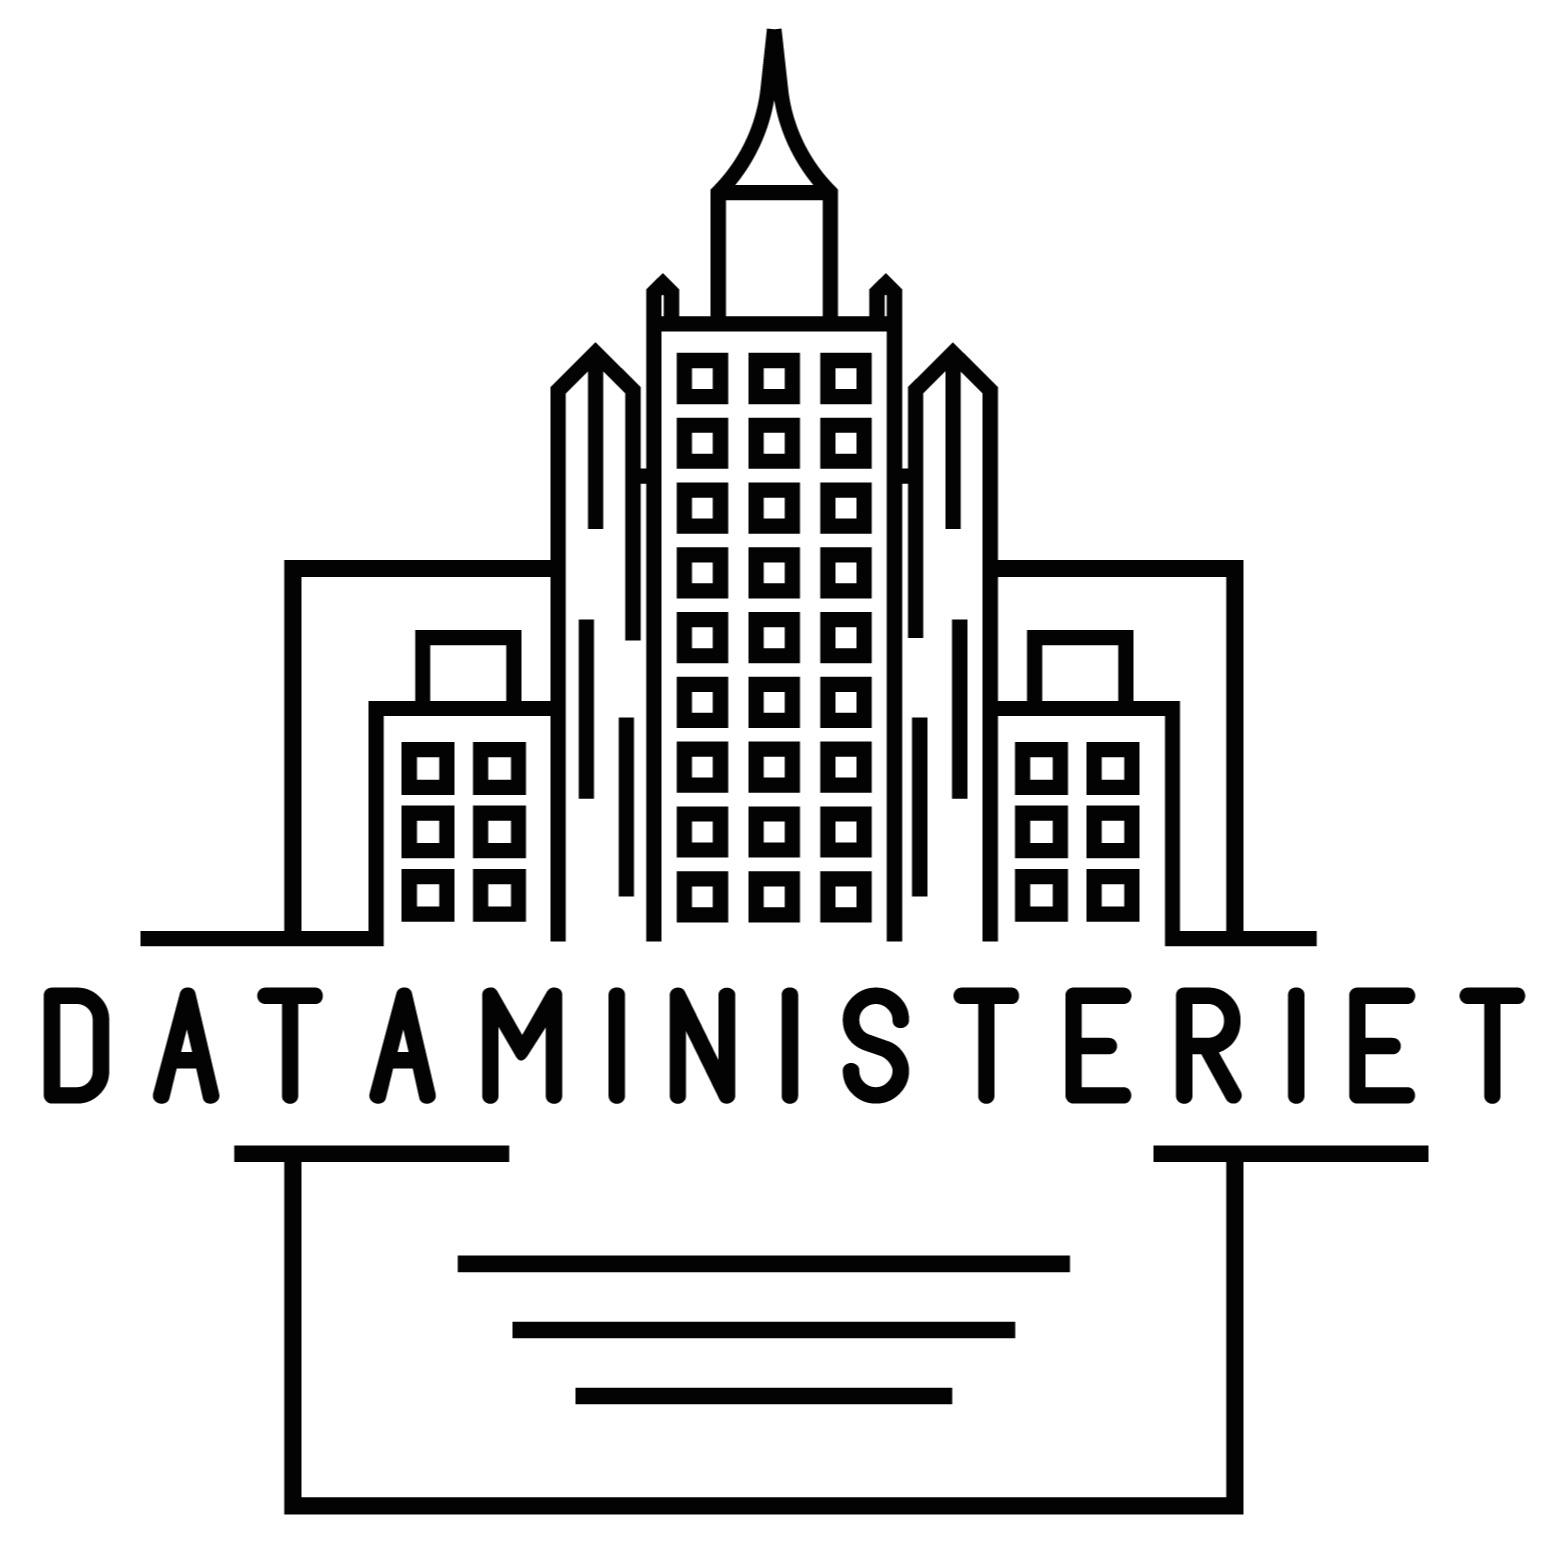 Dataministeriet